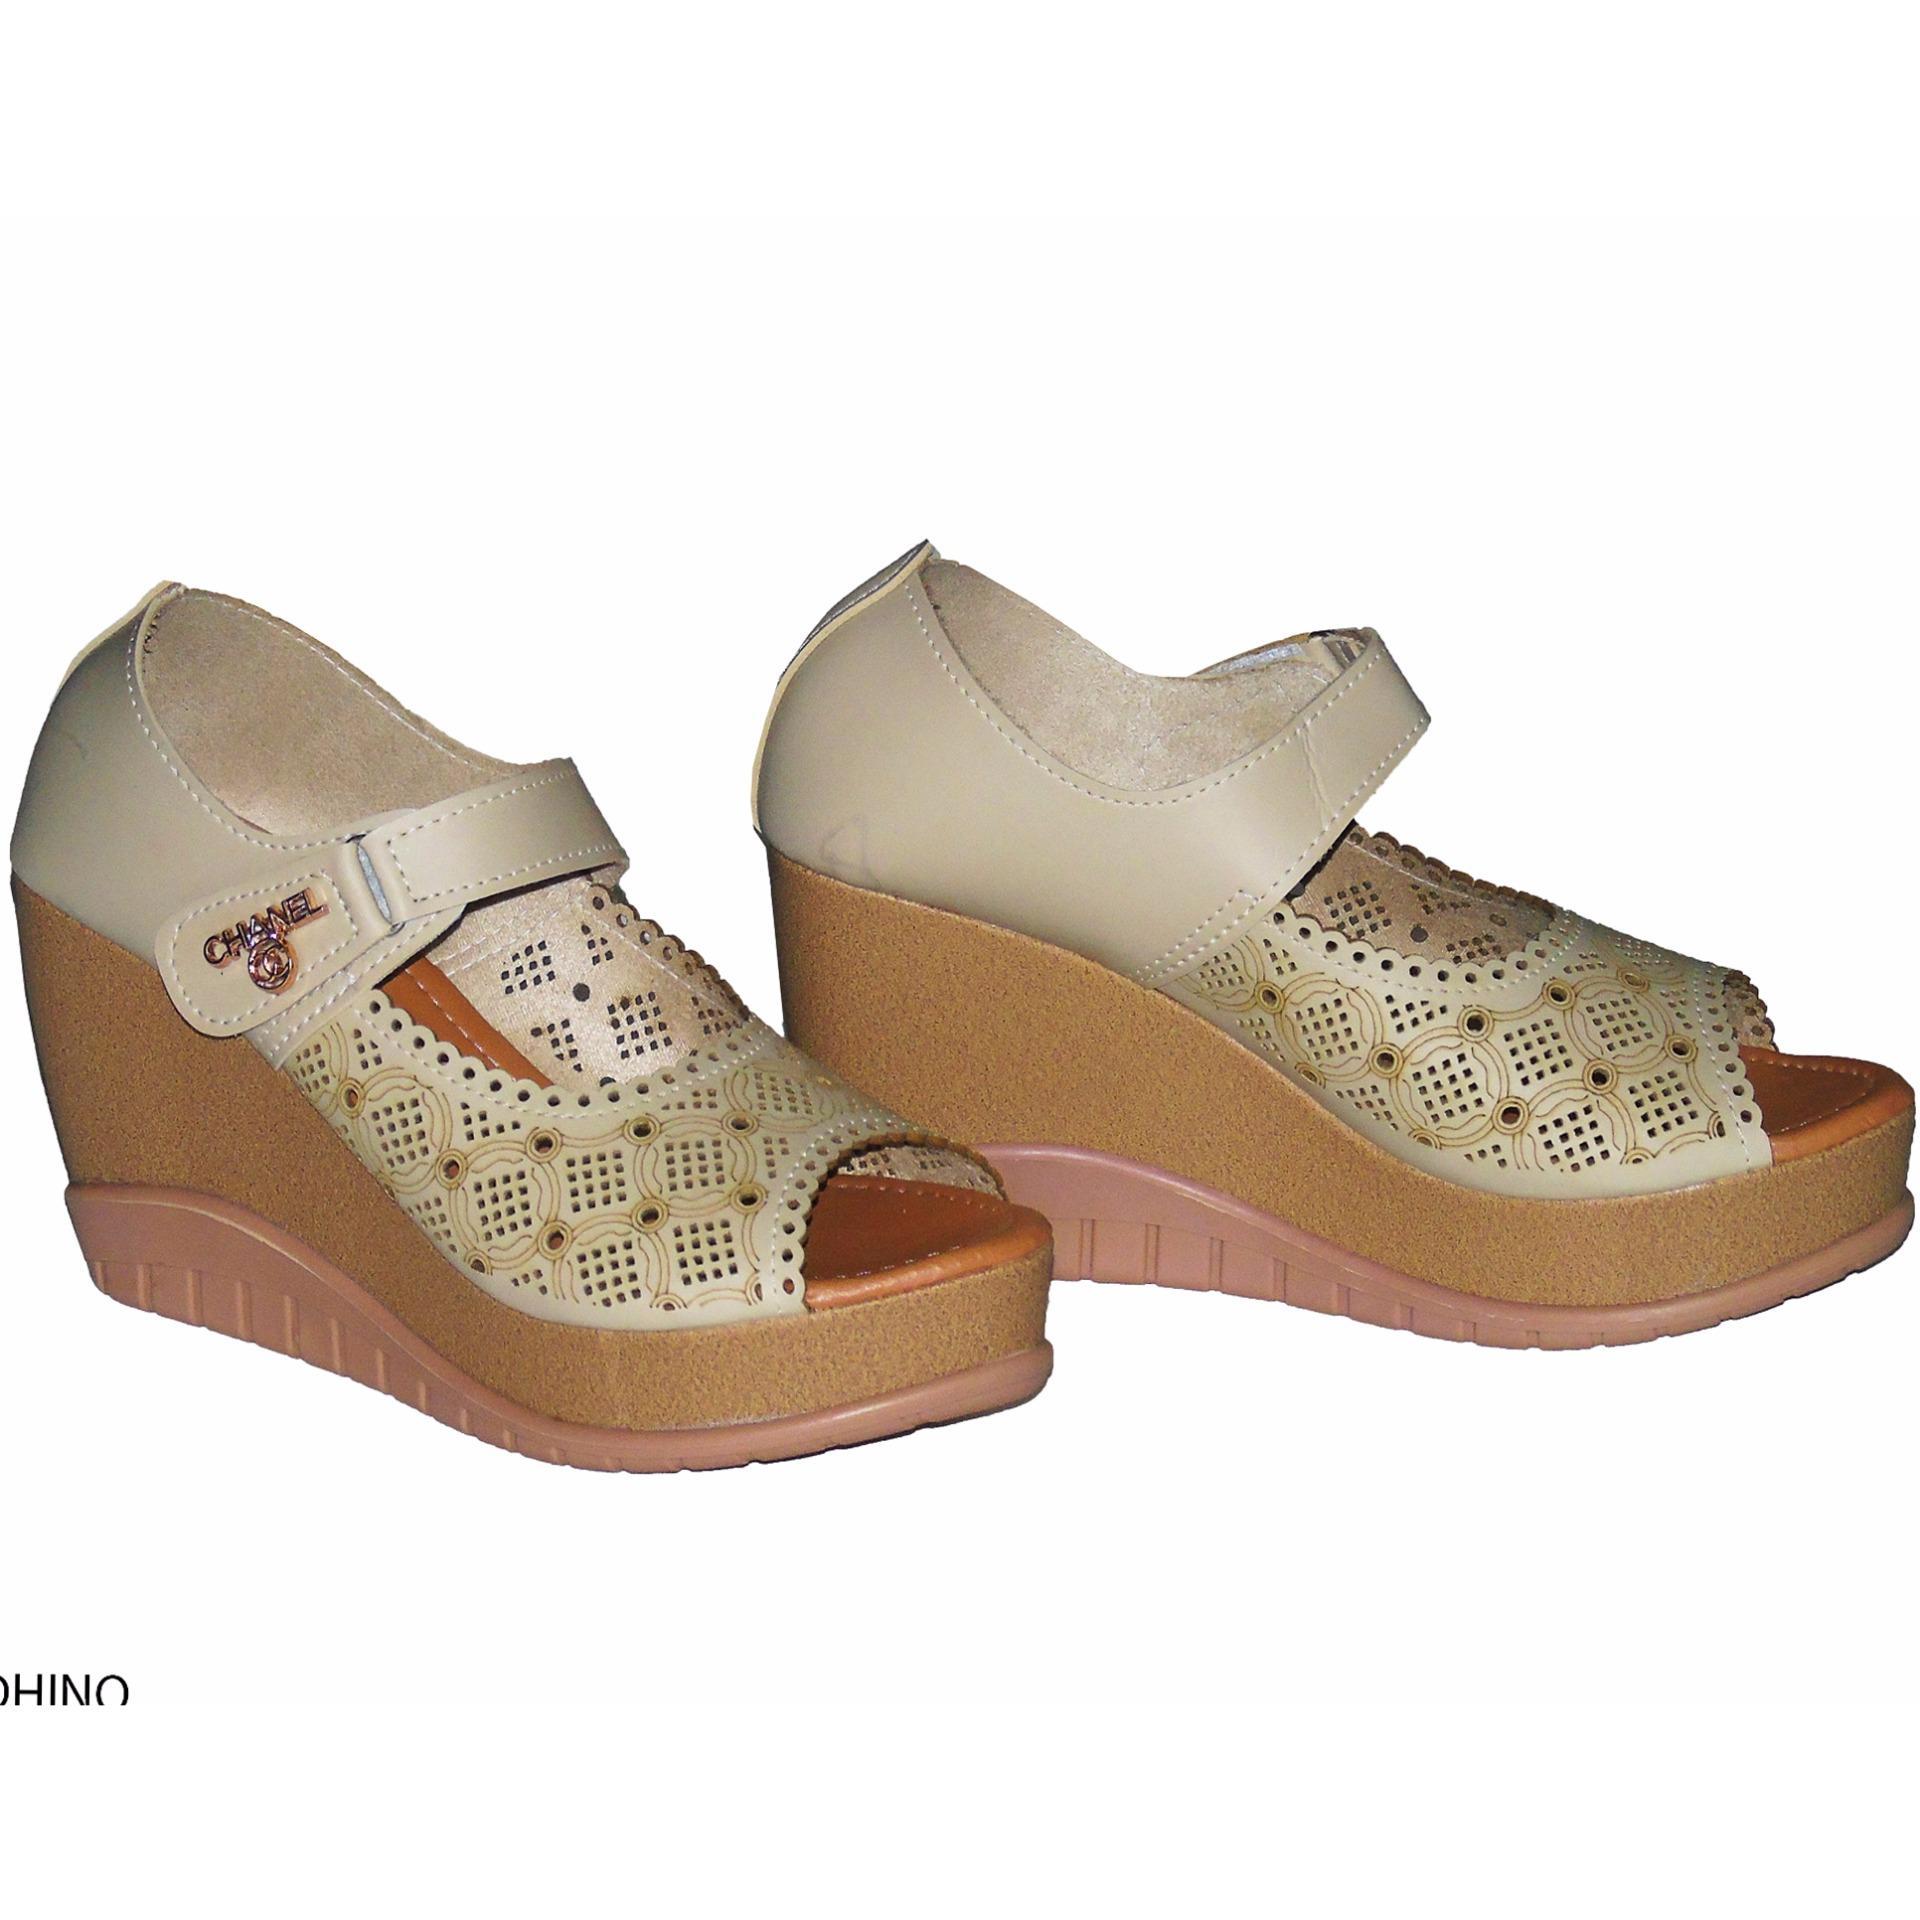 Dapatkan Harga tendadome Diskon Shopee Indonesia Source · Aldhino Sepatu Sandal Wedges Wanita MGS 01 Crem